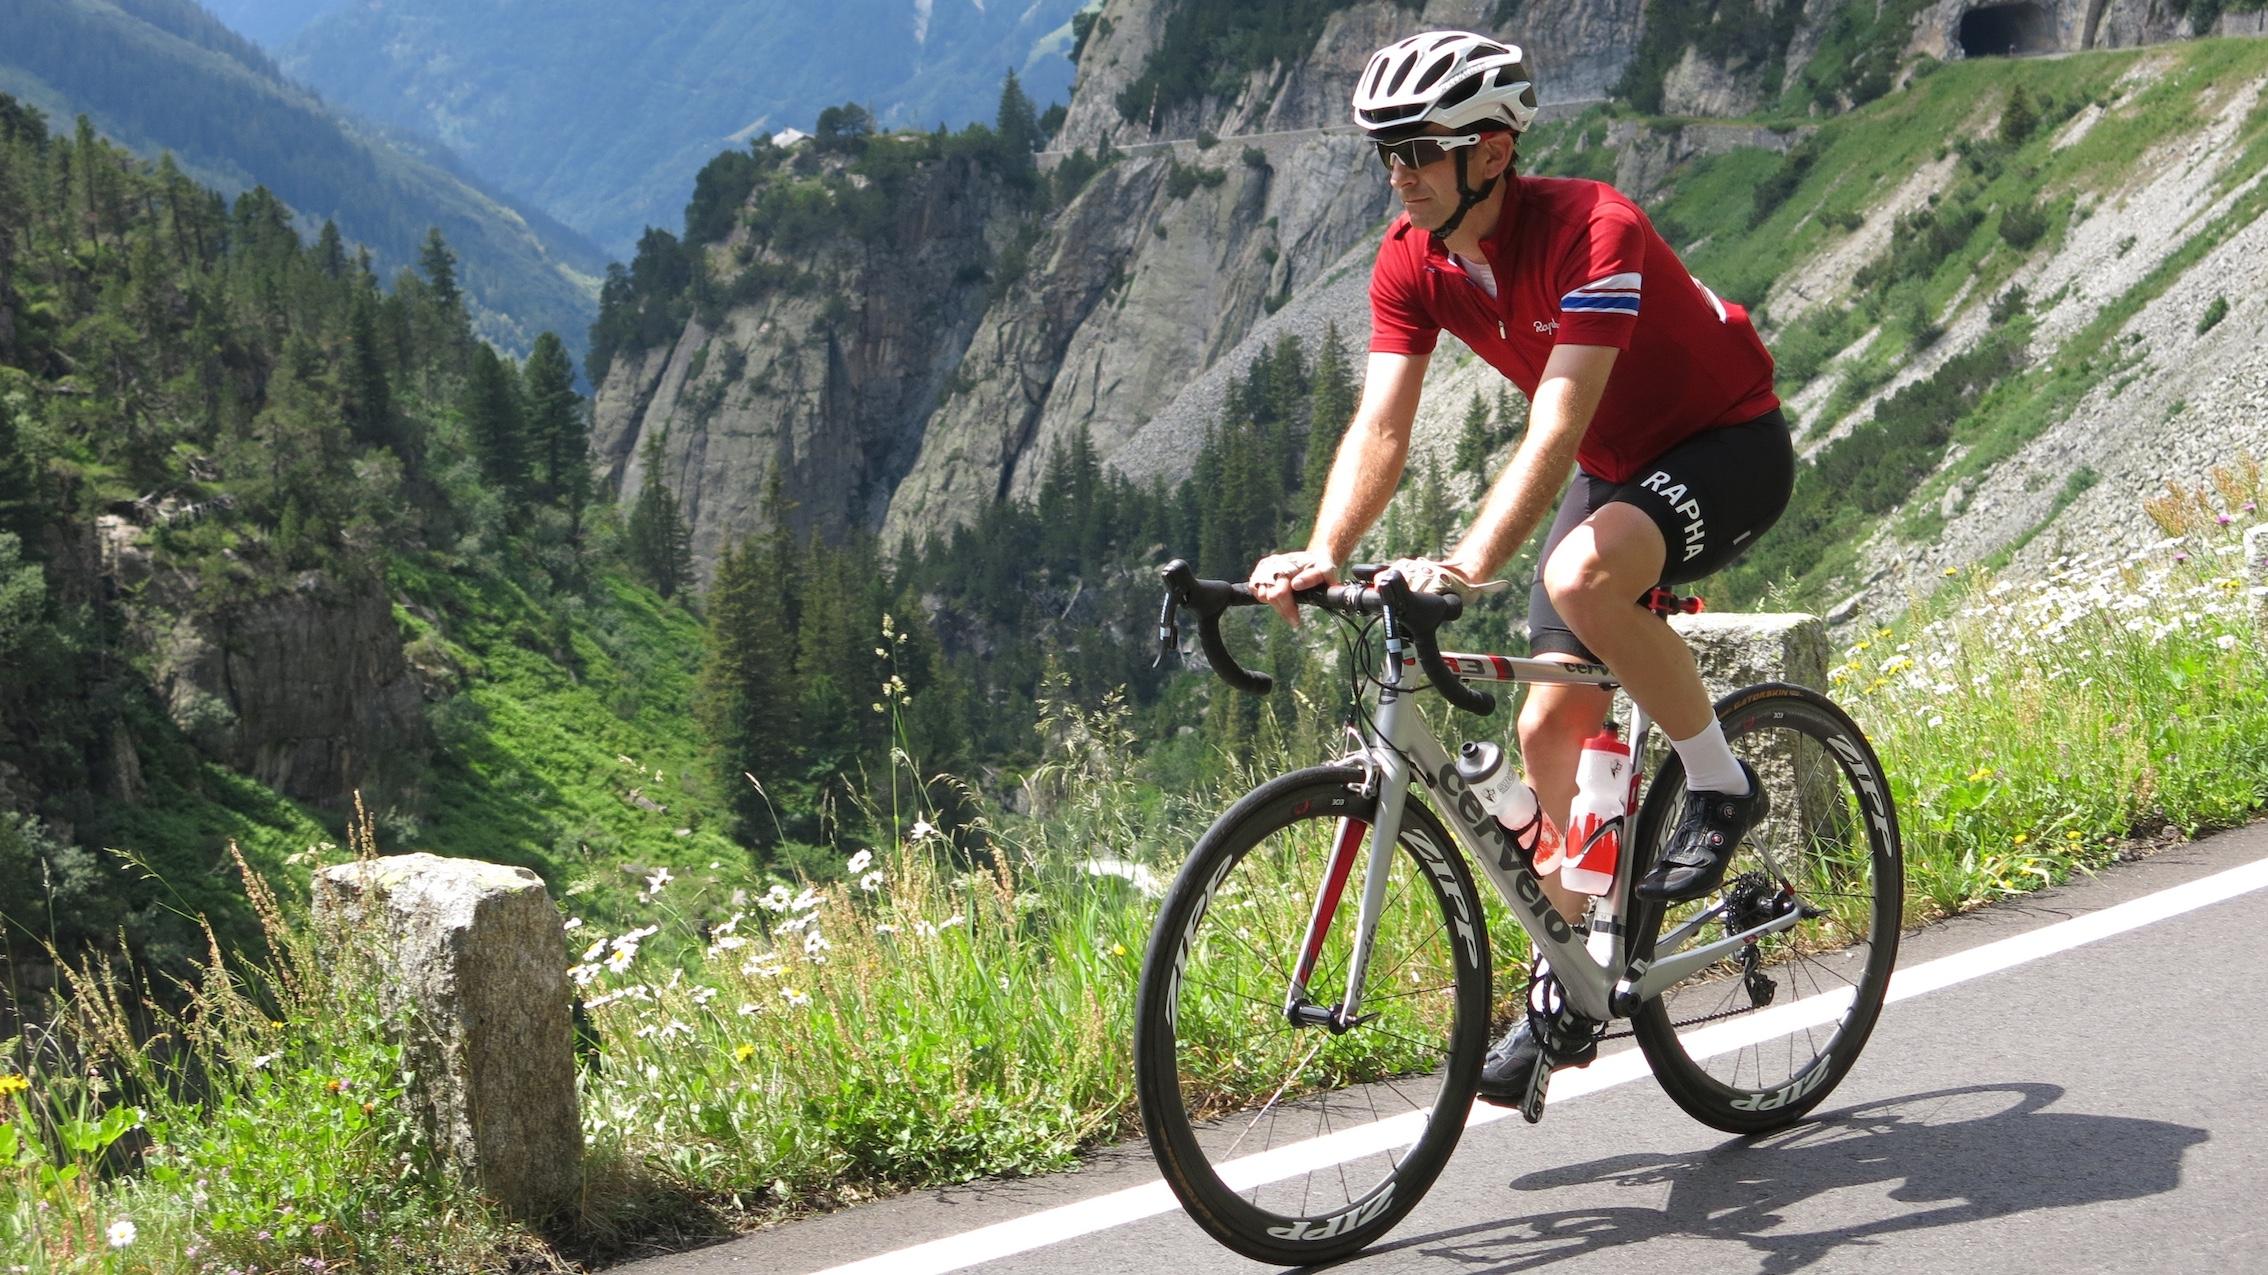 Ricardo Green: KOM, Tour de Suisse 2015. Photo by Jimi Thomson.